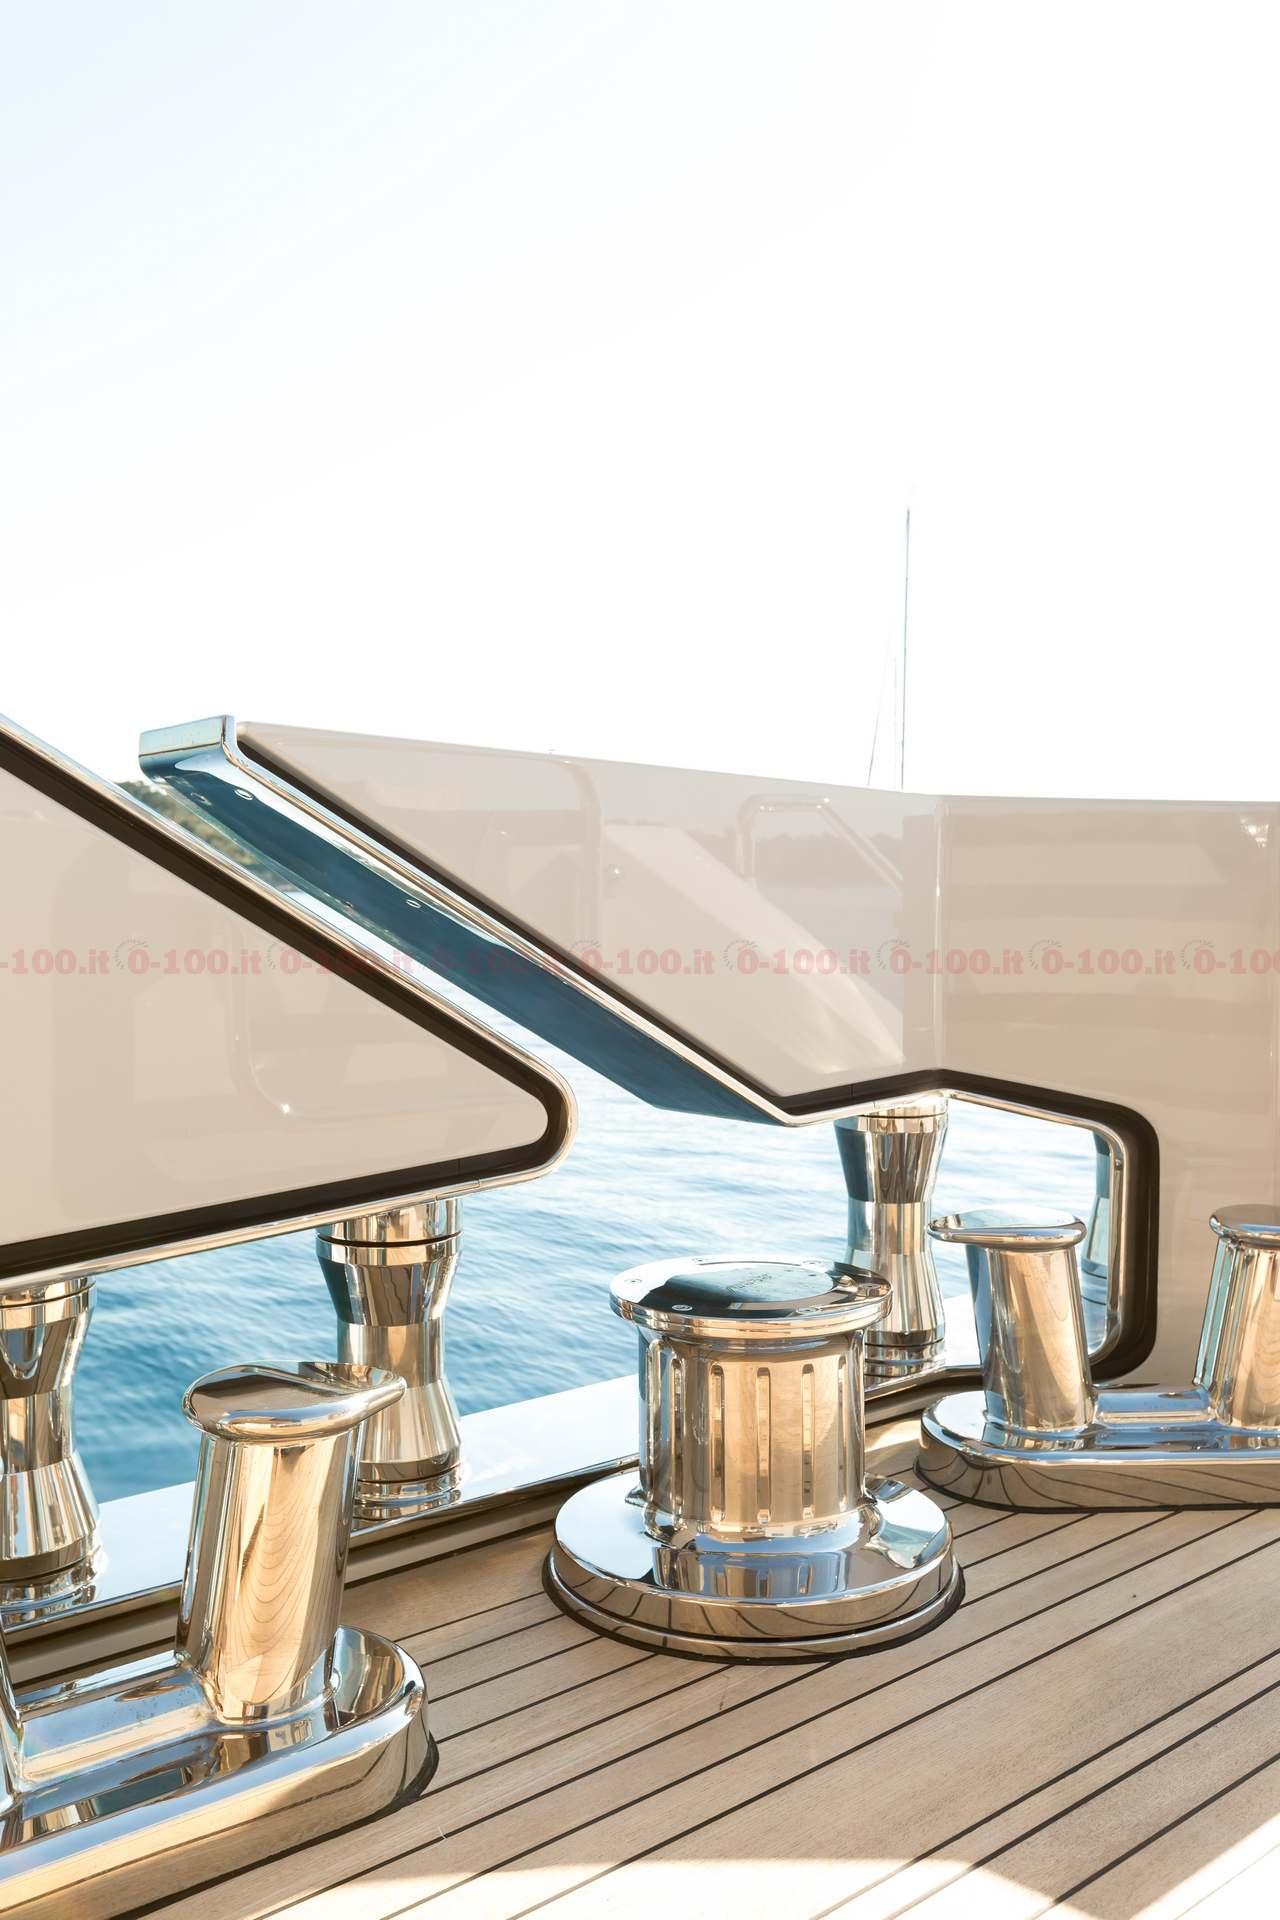 Monaco Yacht Show 2017_ S501 Tankoa Yachts M_Y Vertige_0-10018